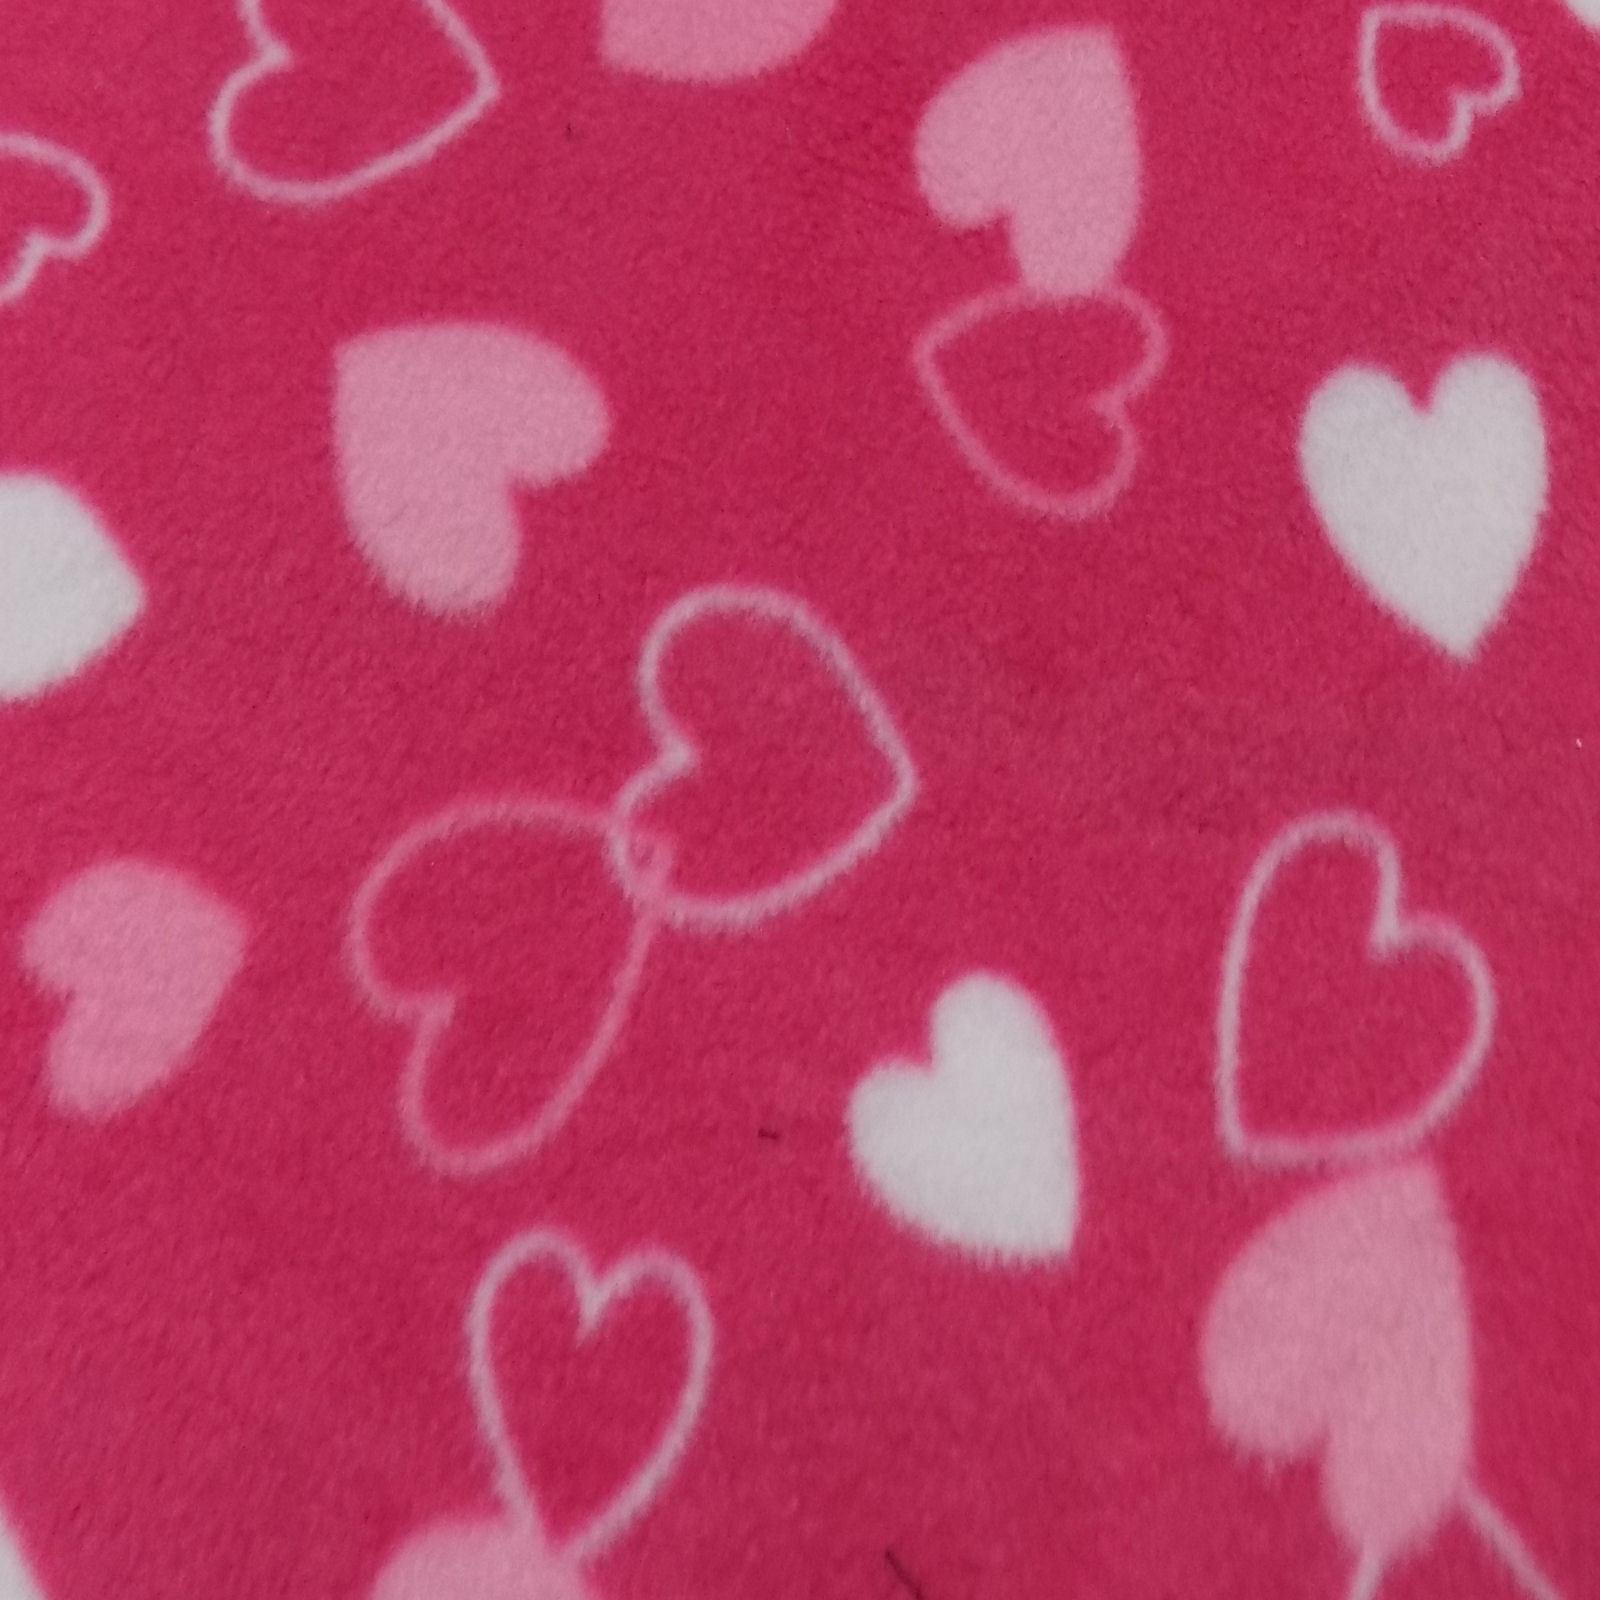 Fabric Fleece Square Bundles Craft Hobby Material Rag Dolls Art Bag Fat QUARTERS